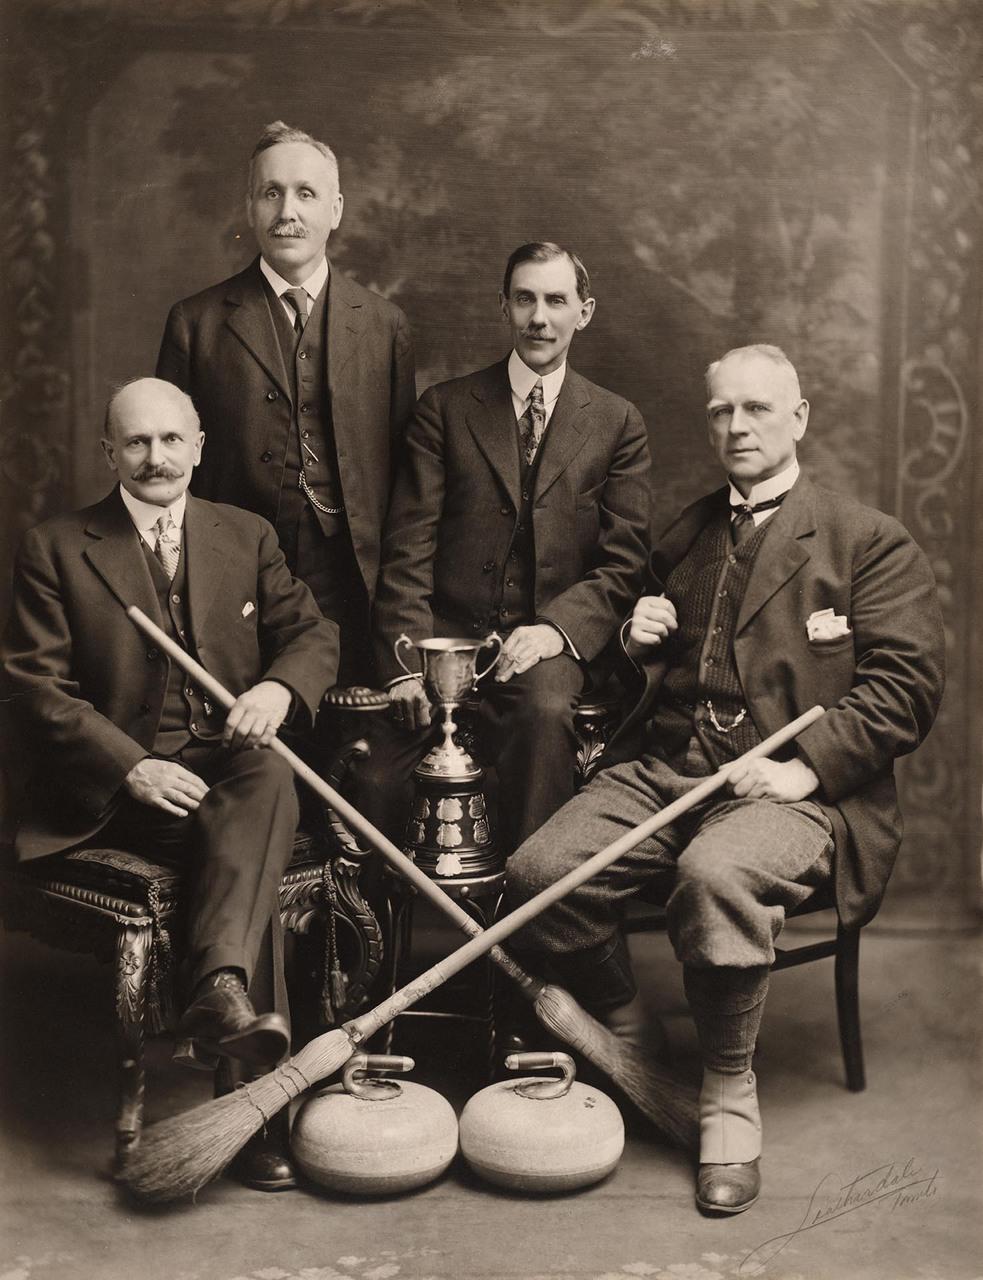 Flavelle Cup Curling Trophy Winners 1915-1916